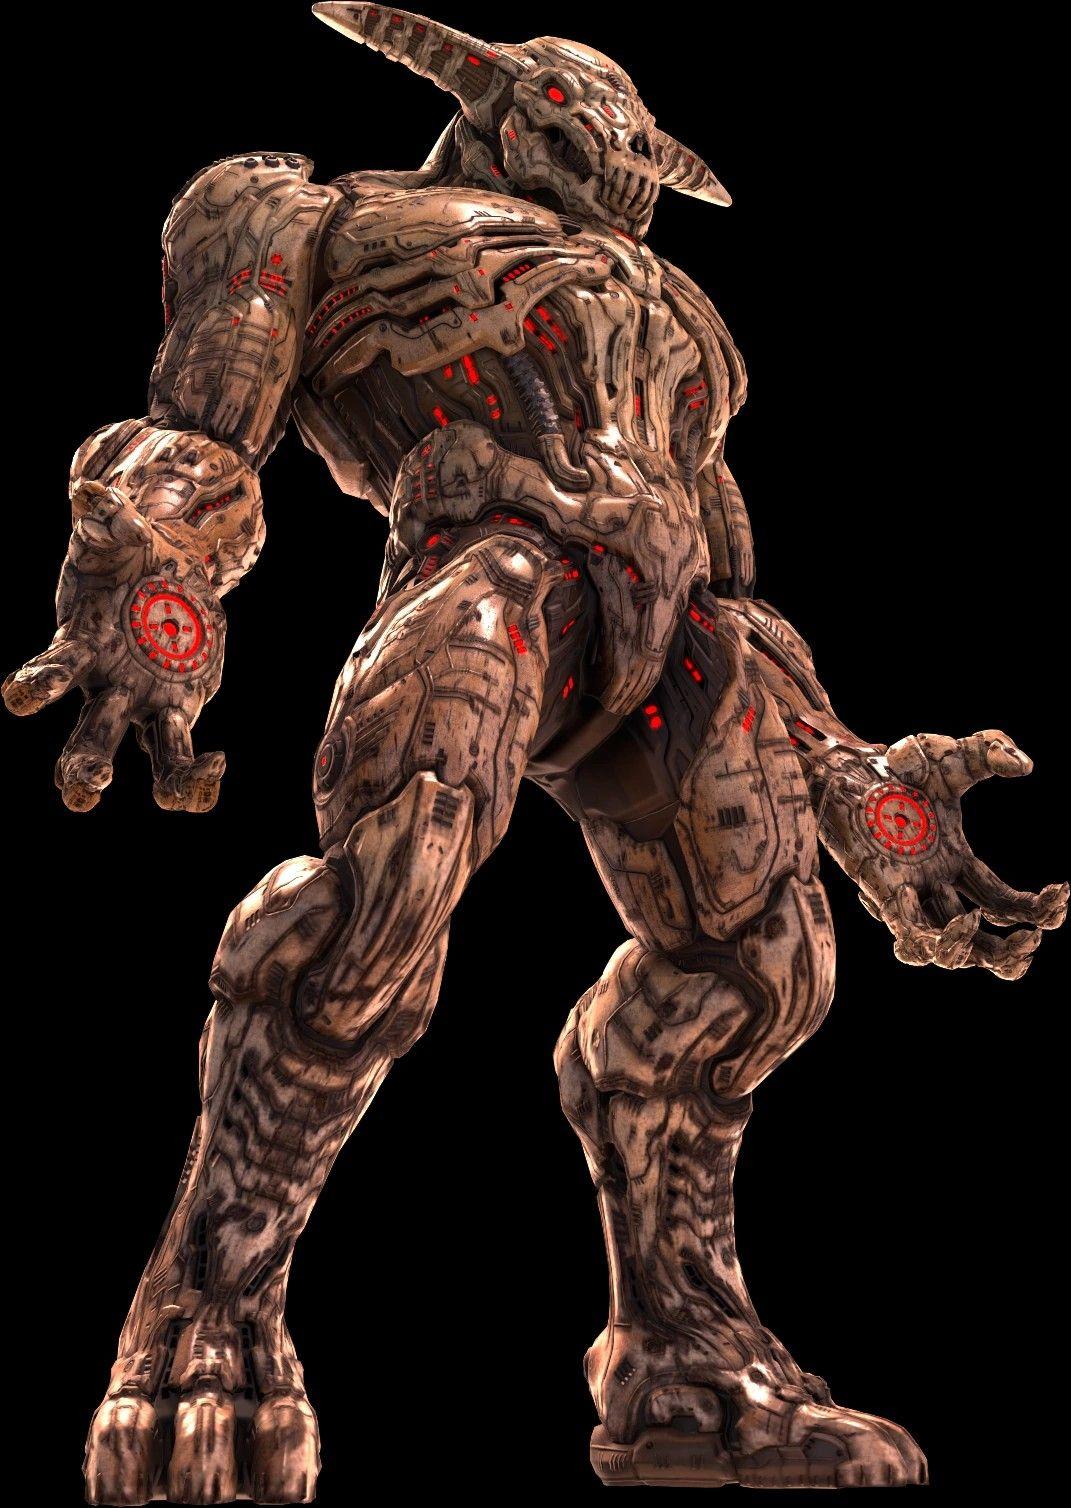 Doom Eternal The Icon Of Sin in 2020 Lion sculpture